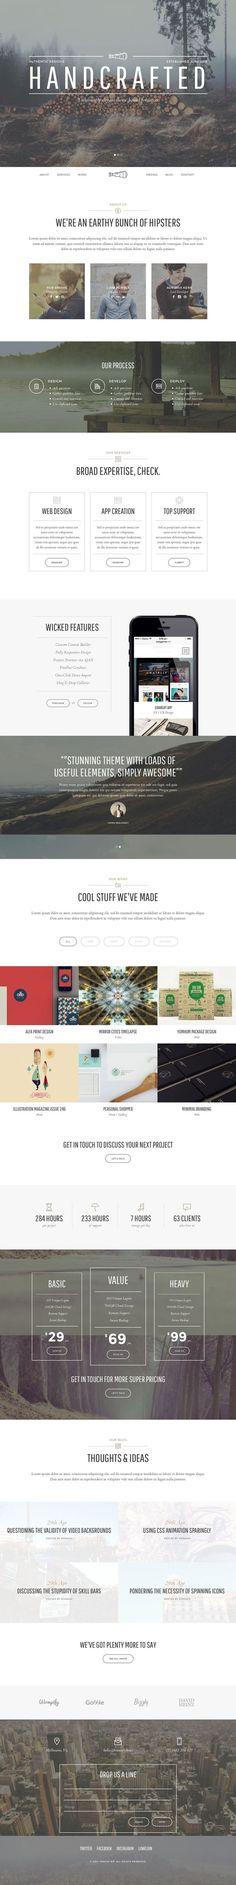 Thread - Multi-Purpose One + Multi Page theme by Bitfade #wordpress #themeforest…